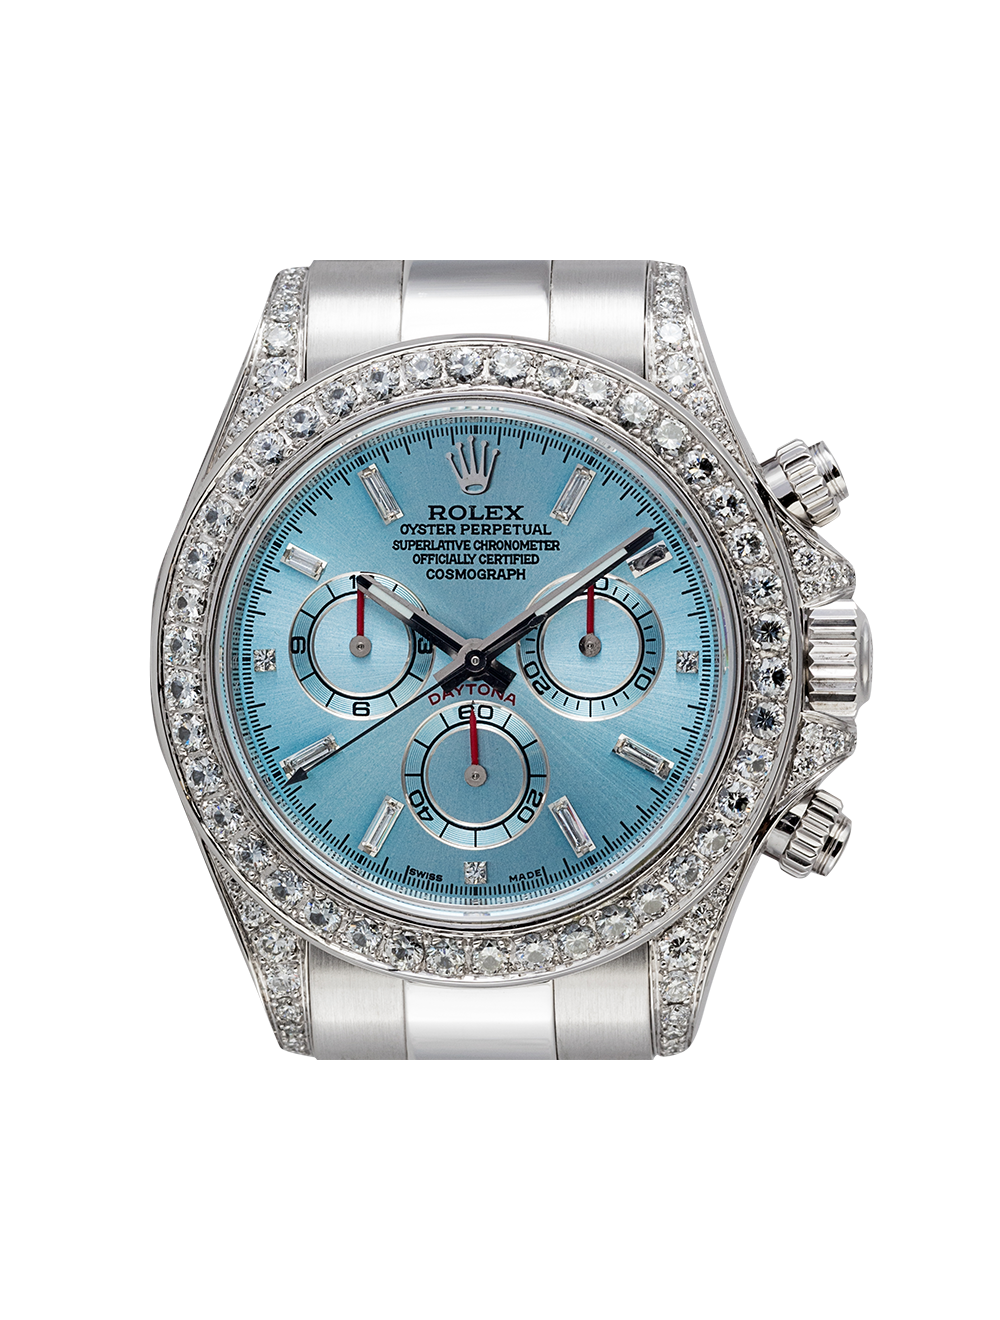 Rolex Daytona White Gold Ice Diamonds Diamond Set Custom Watch 116509